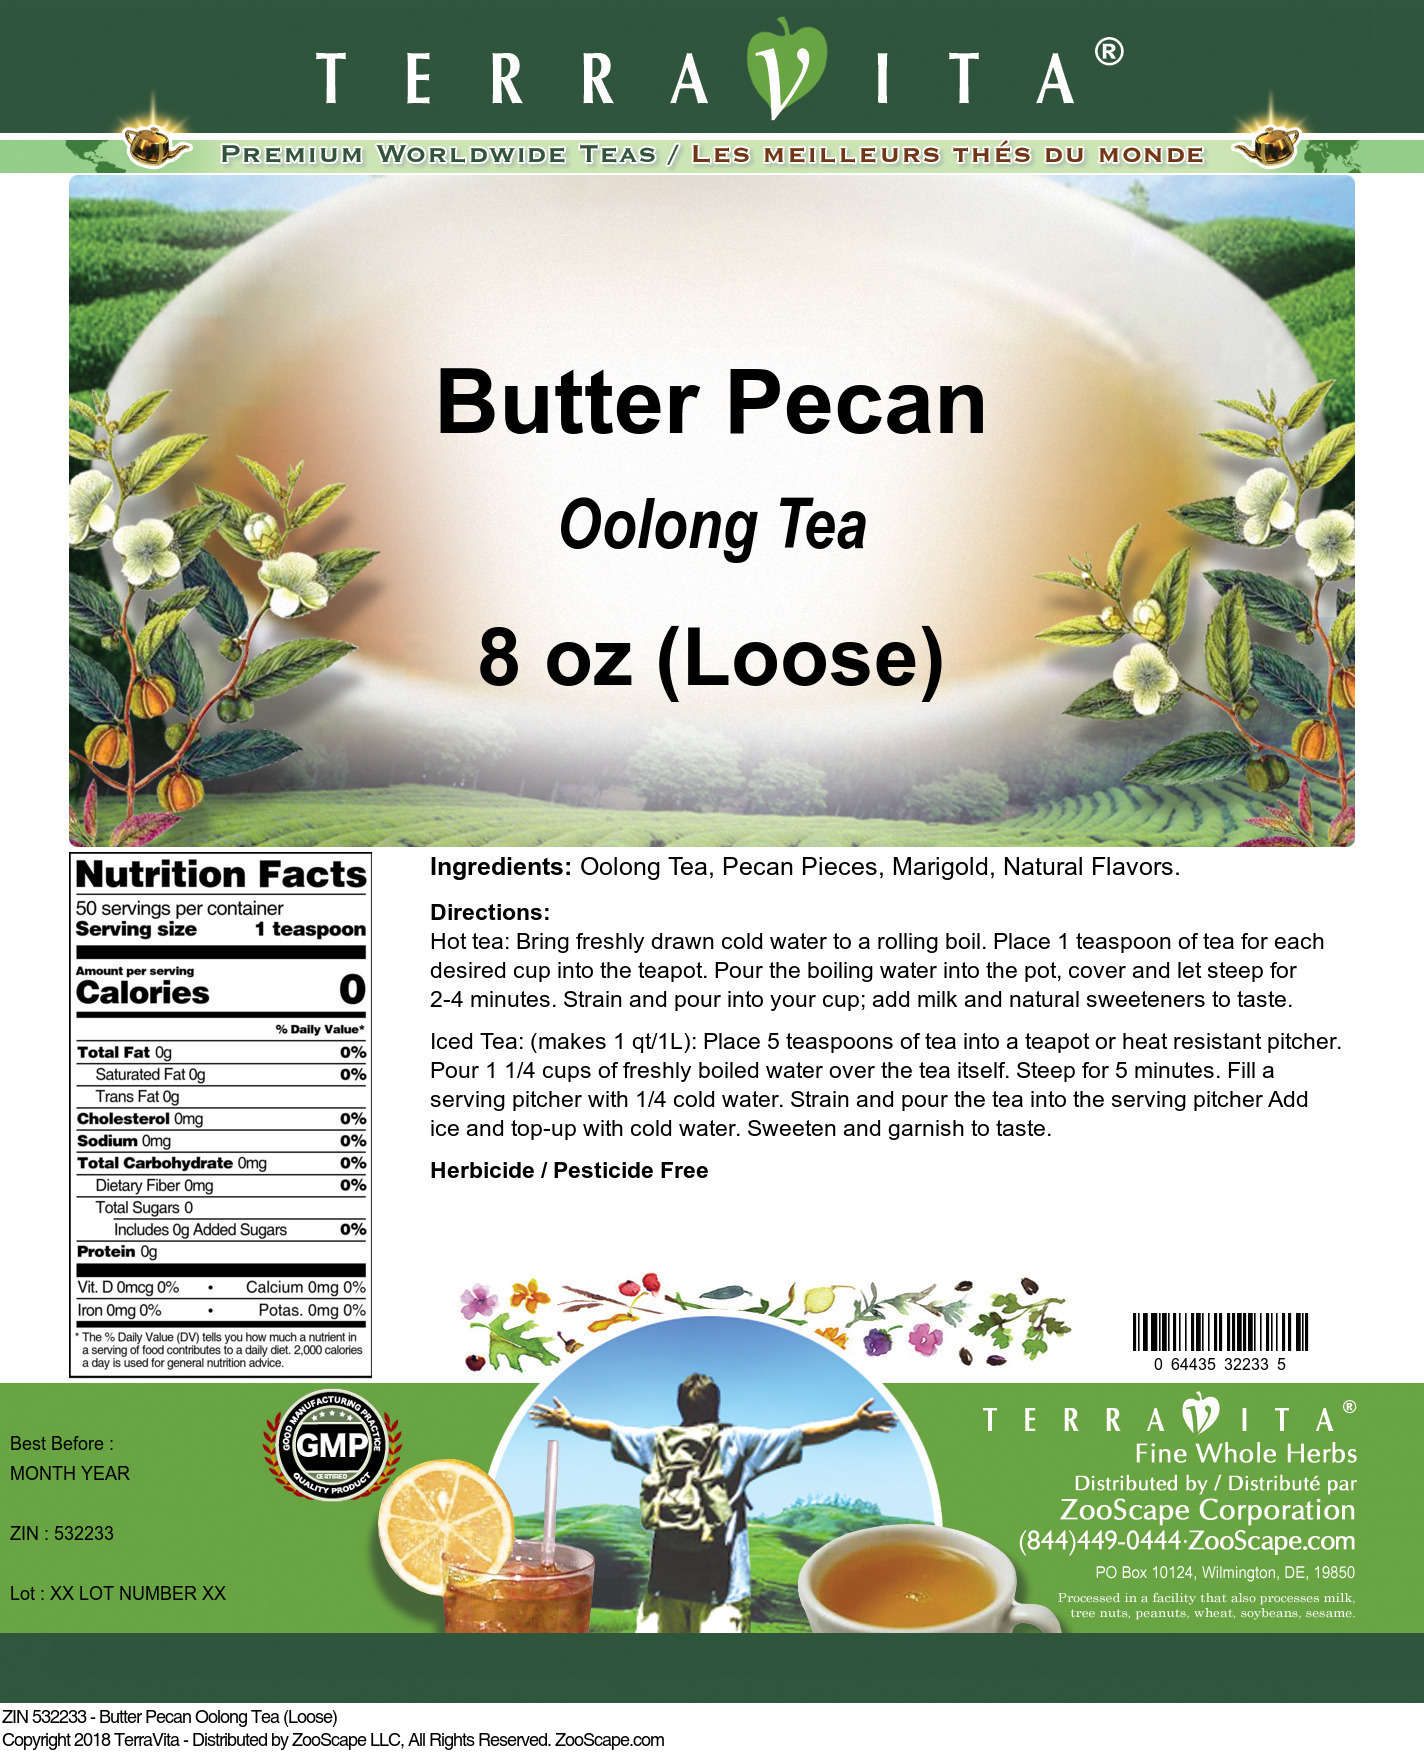 Butter Pecan Oolong Tea (Loose)